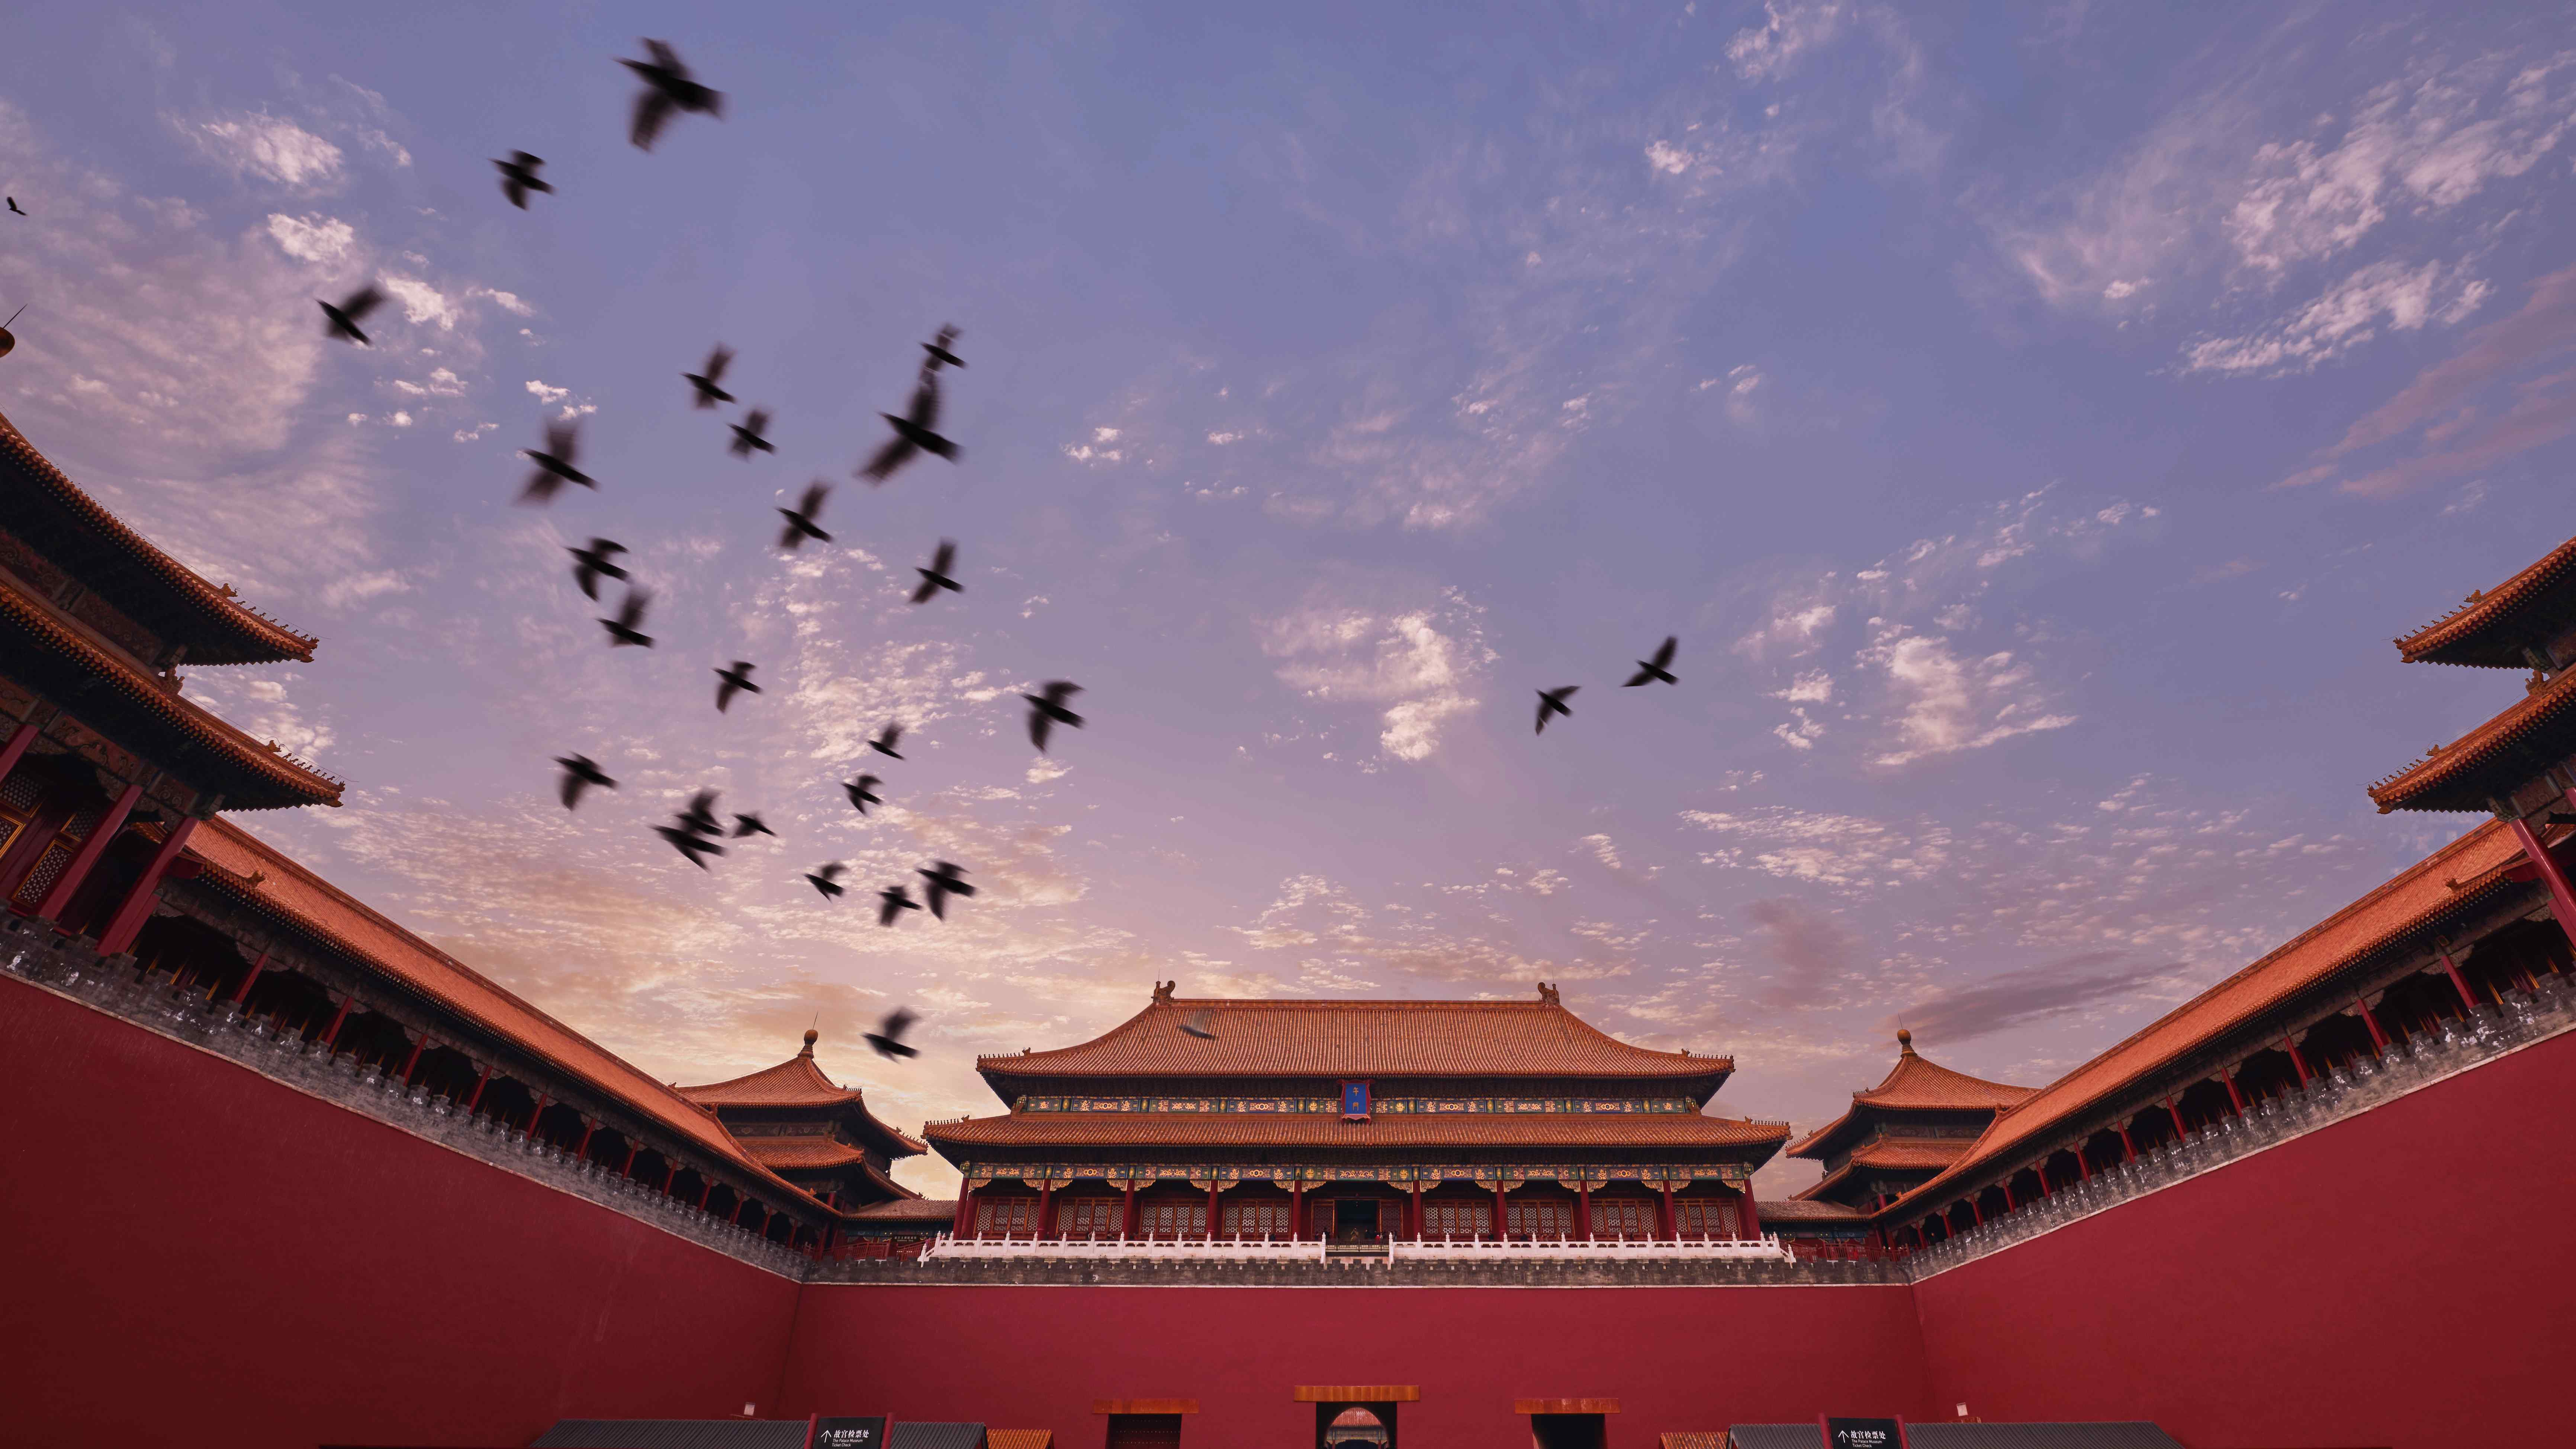 Over 1.5 million migratory birds travel to Beijing